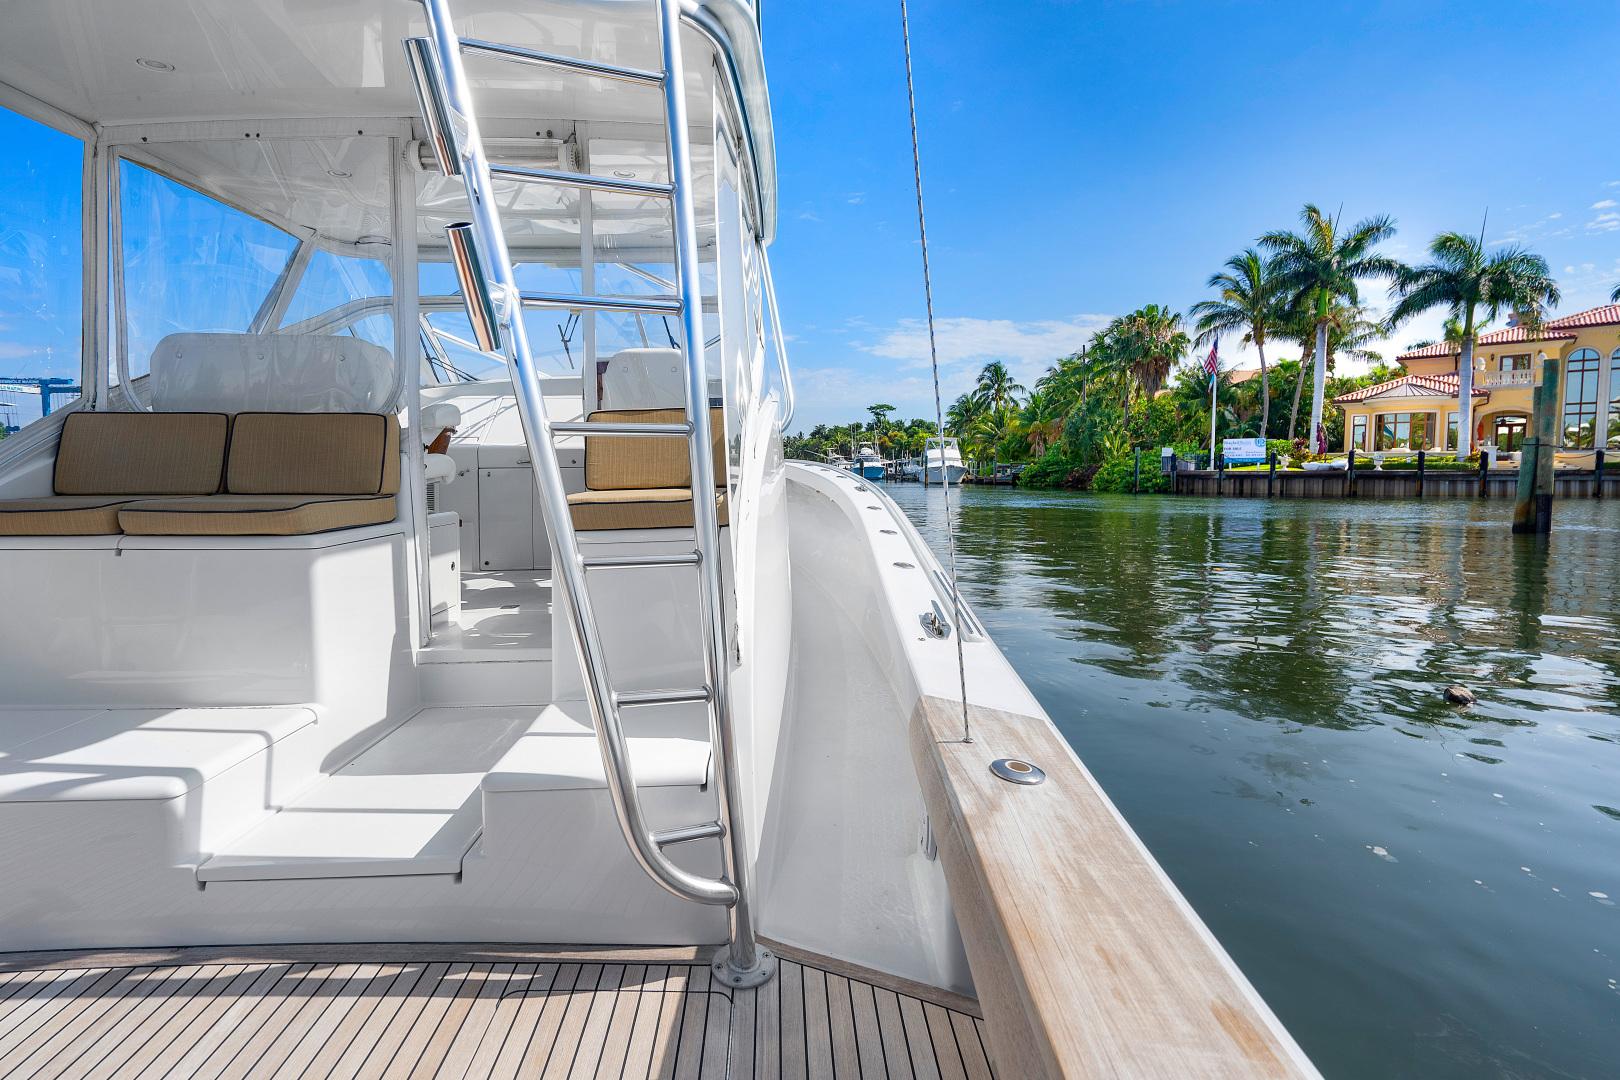 Release-Walkaround 2014-De Bowat Palm Beach Gardens-United States-1364498 | Thumbnail